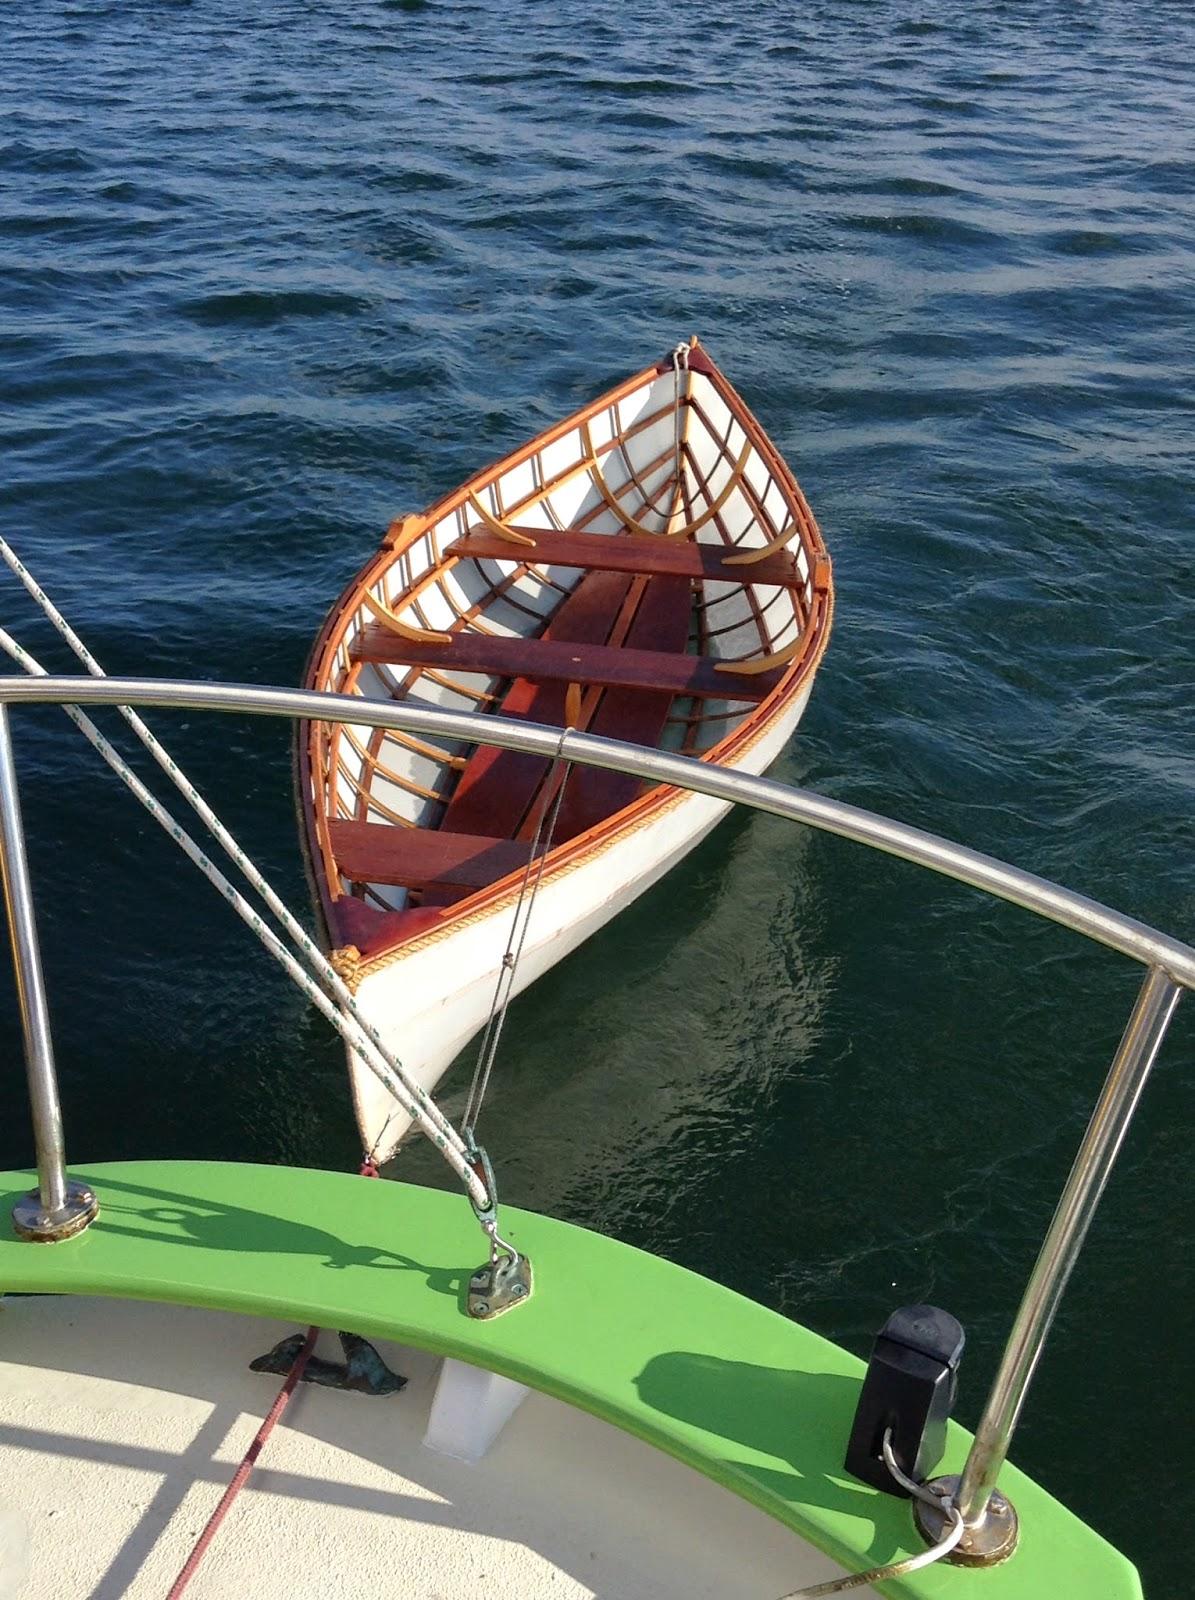 Emerald Marine Carpentry: Practical Skin on Frame Boats